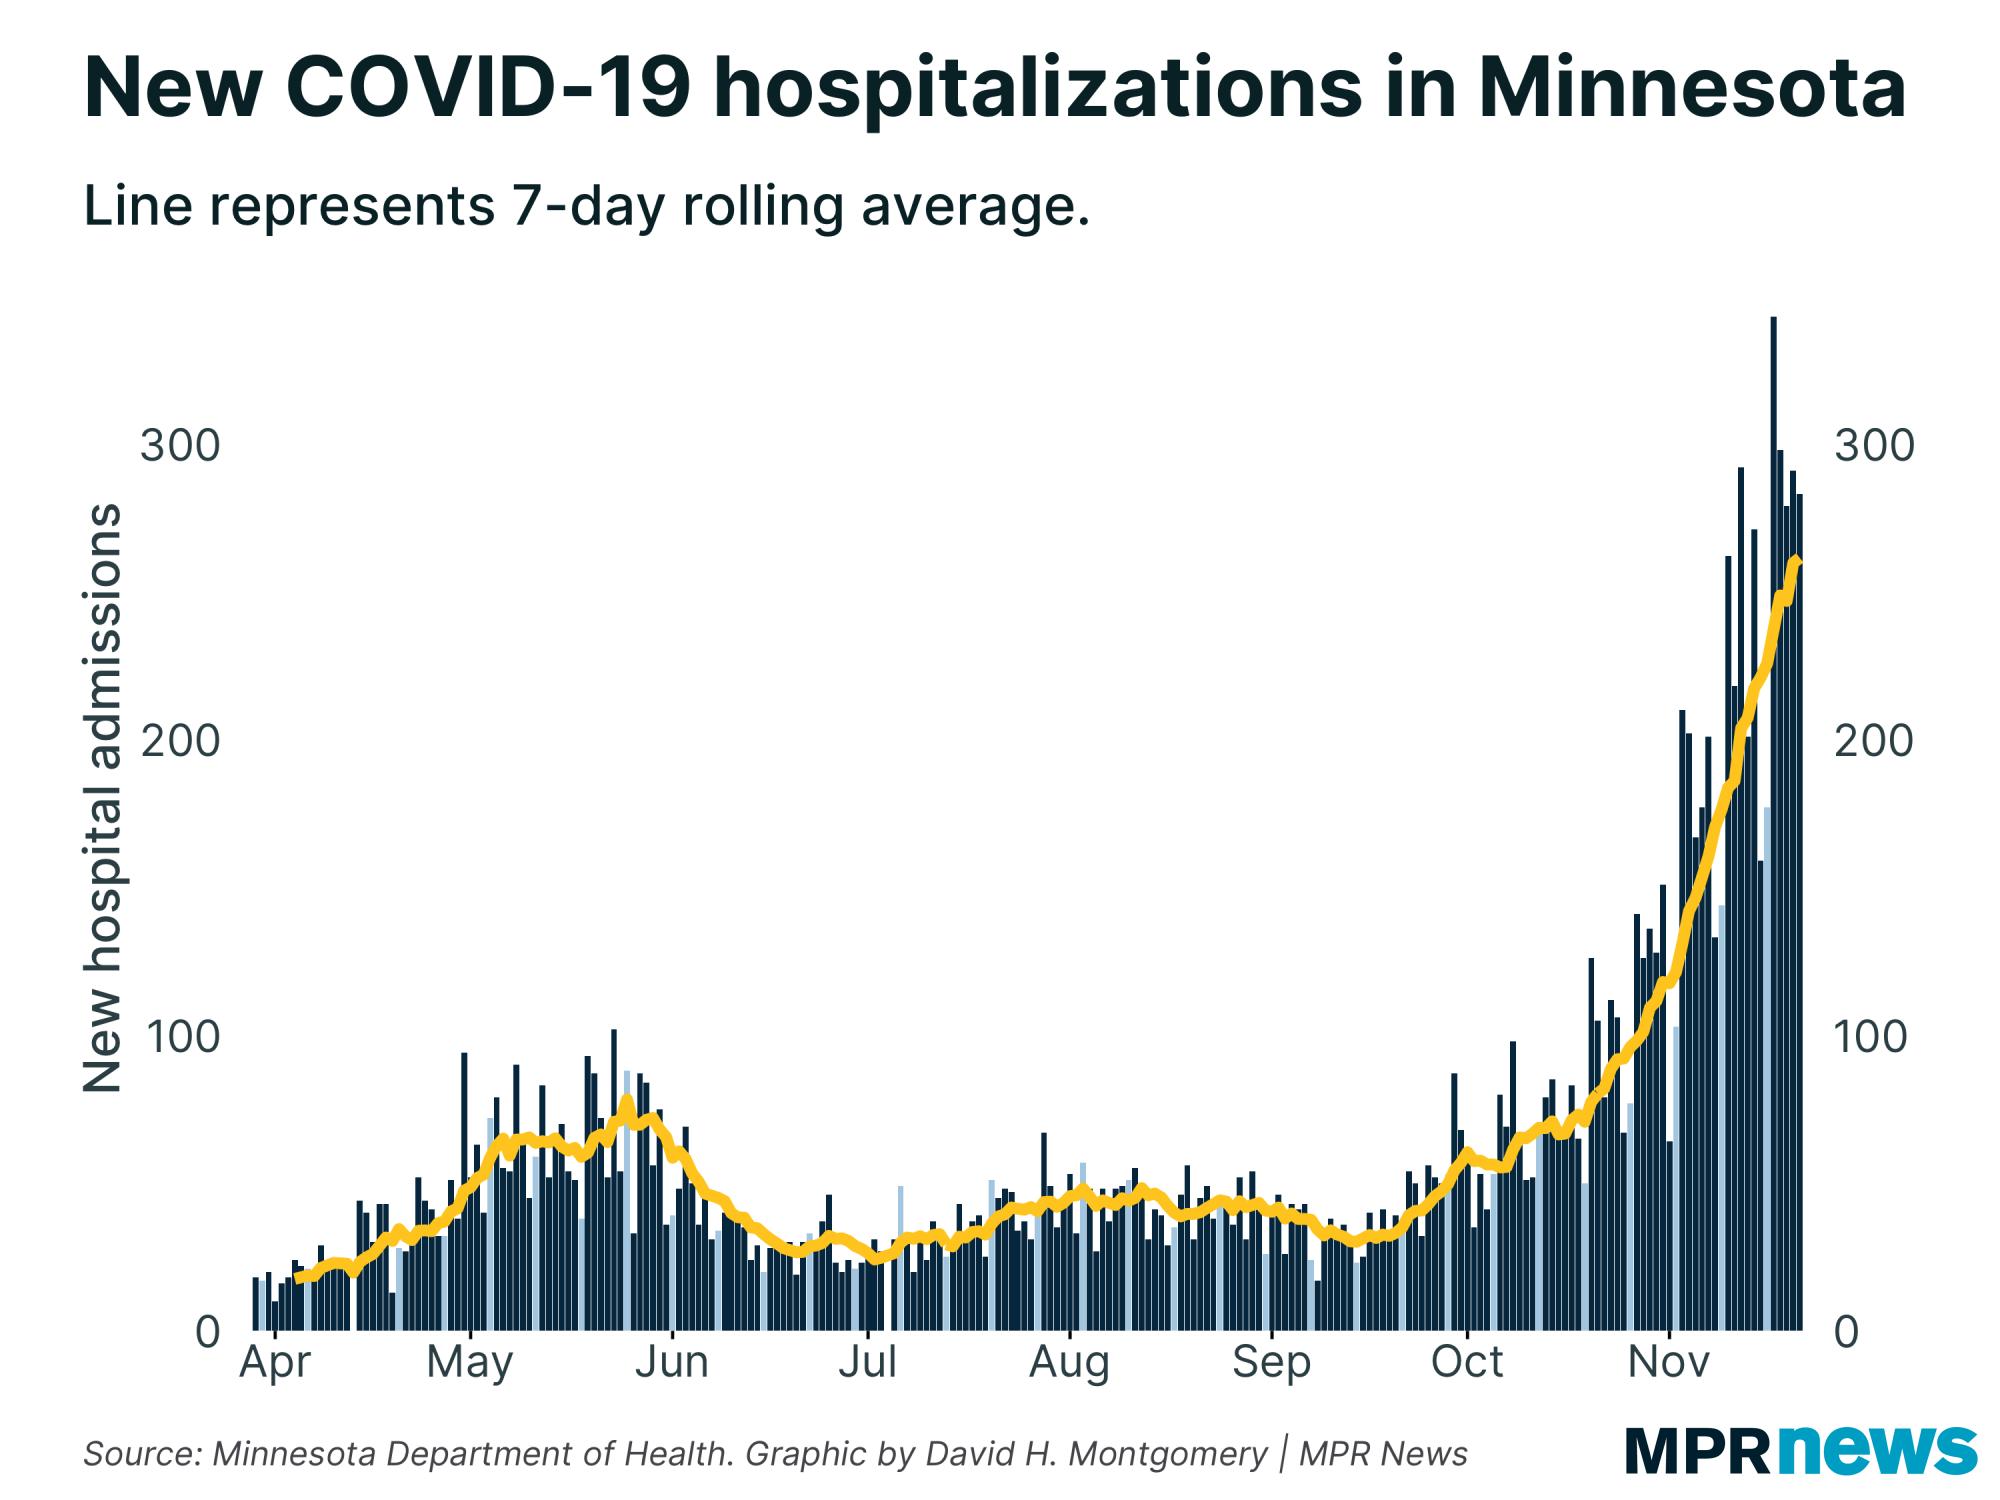 New COVID-19 hospitalizations in Minnesota